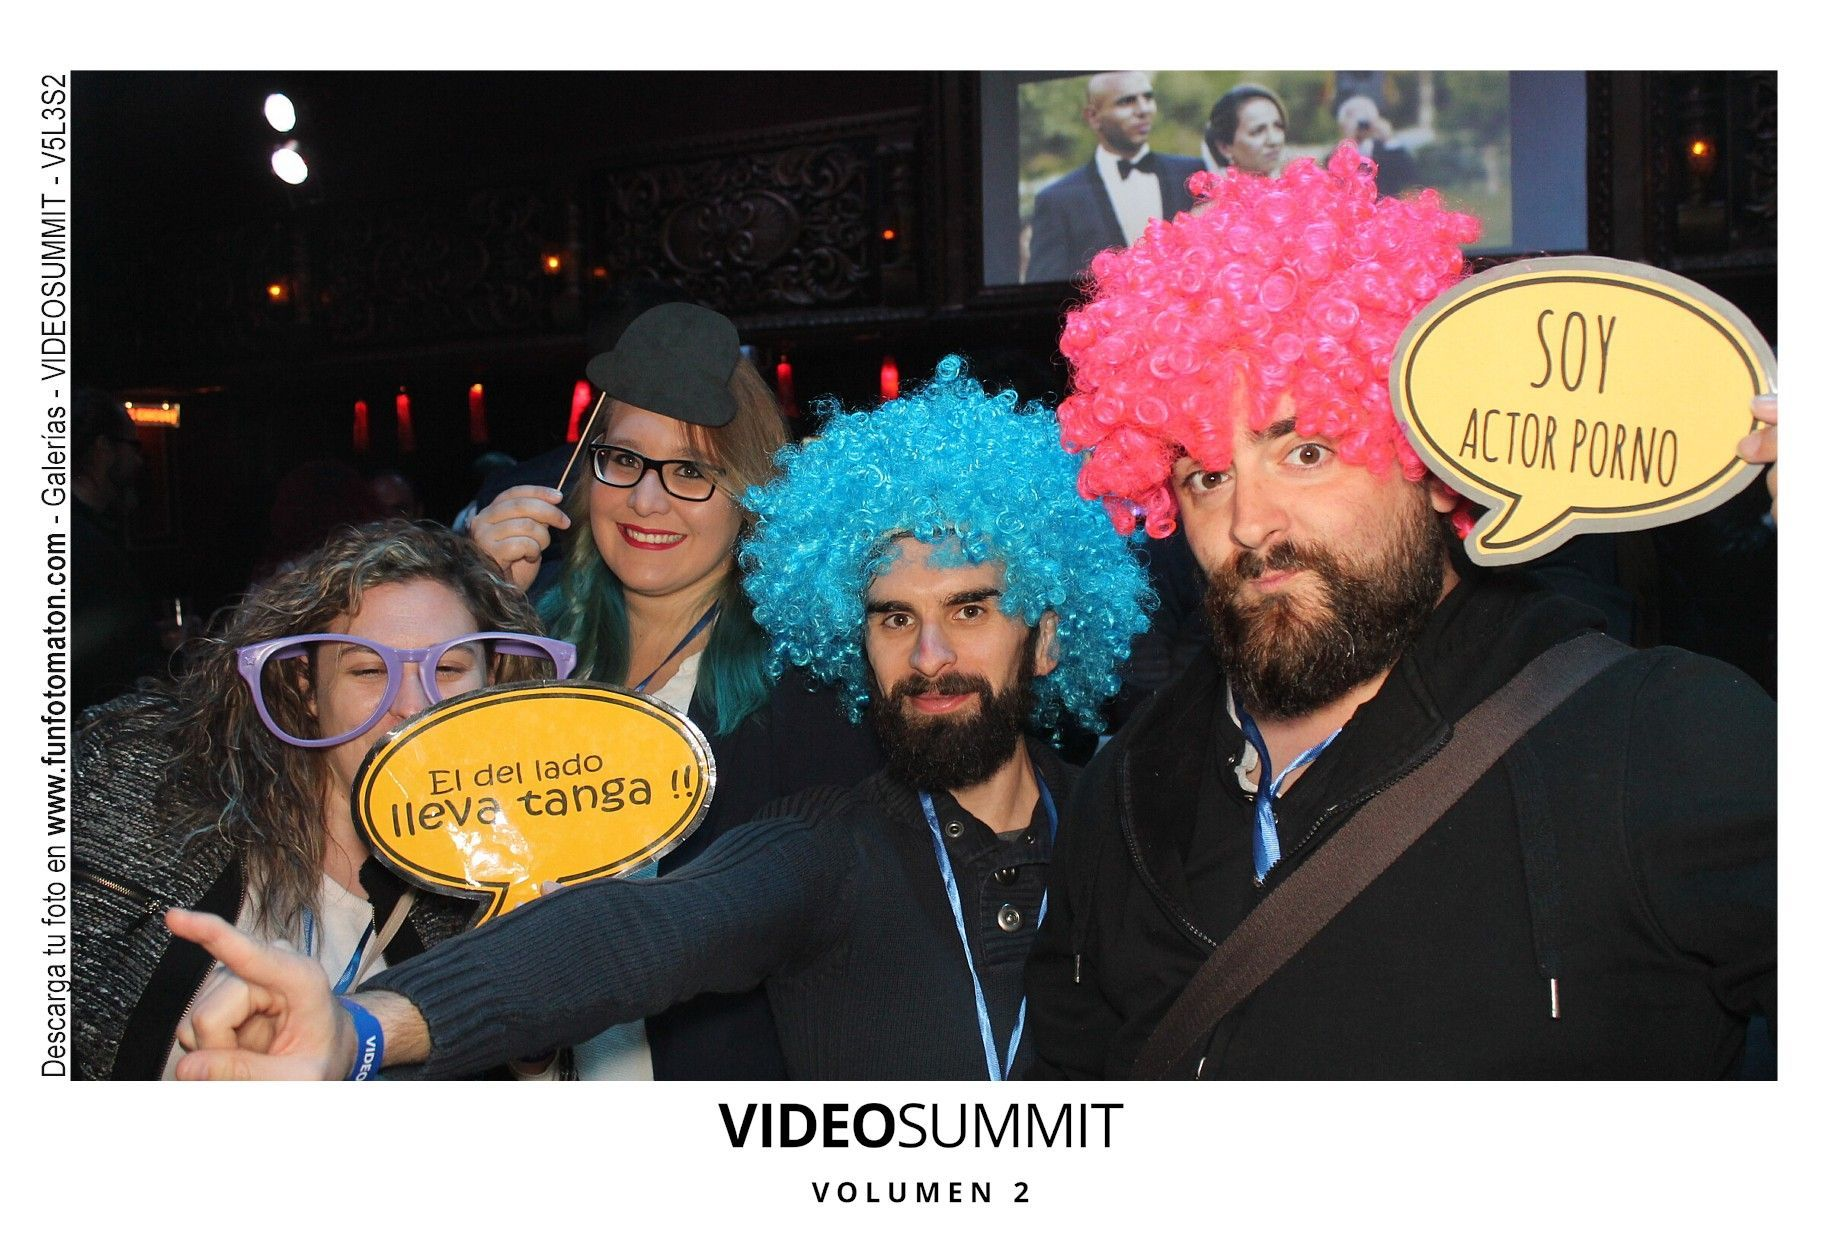 videosummit-vol2-club-party-051